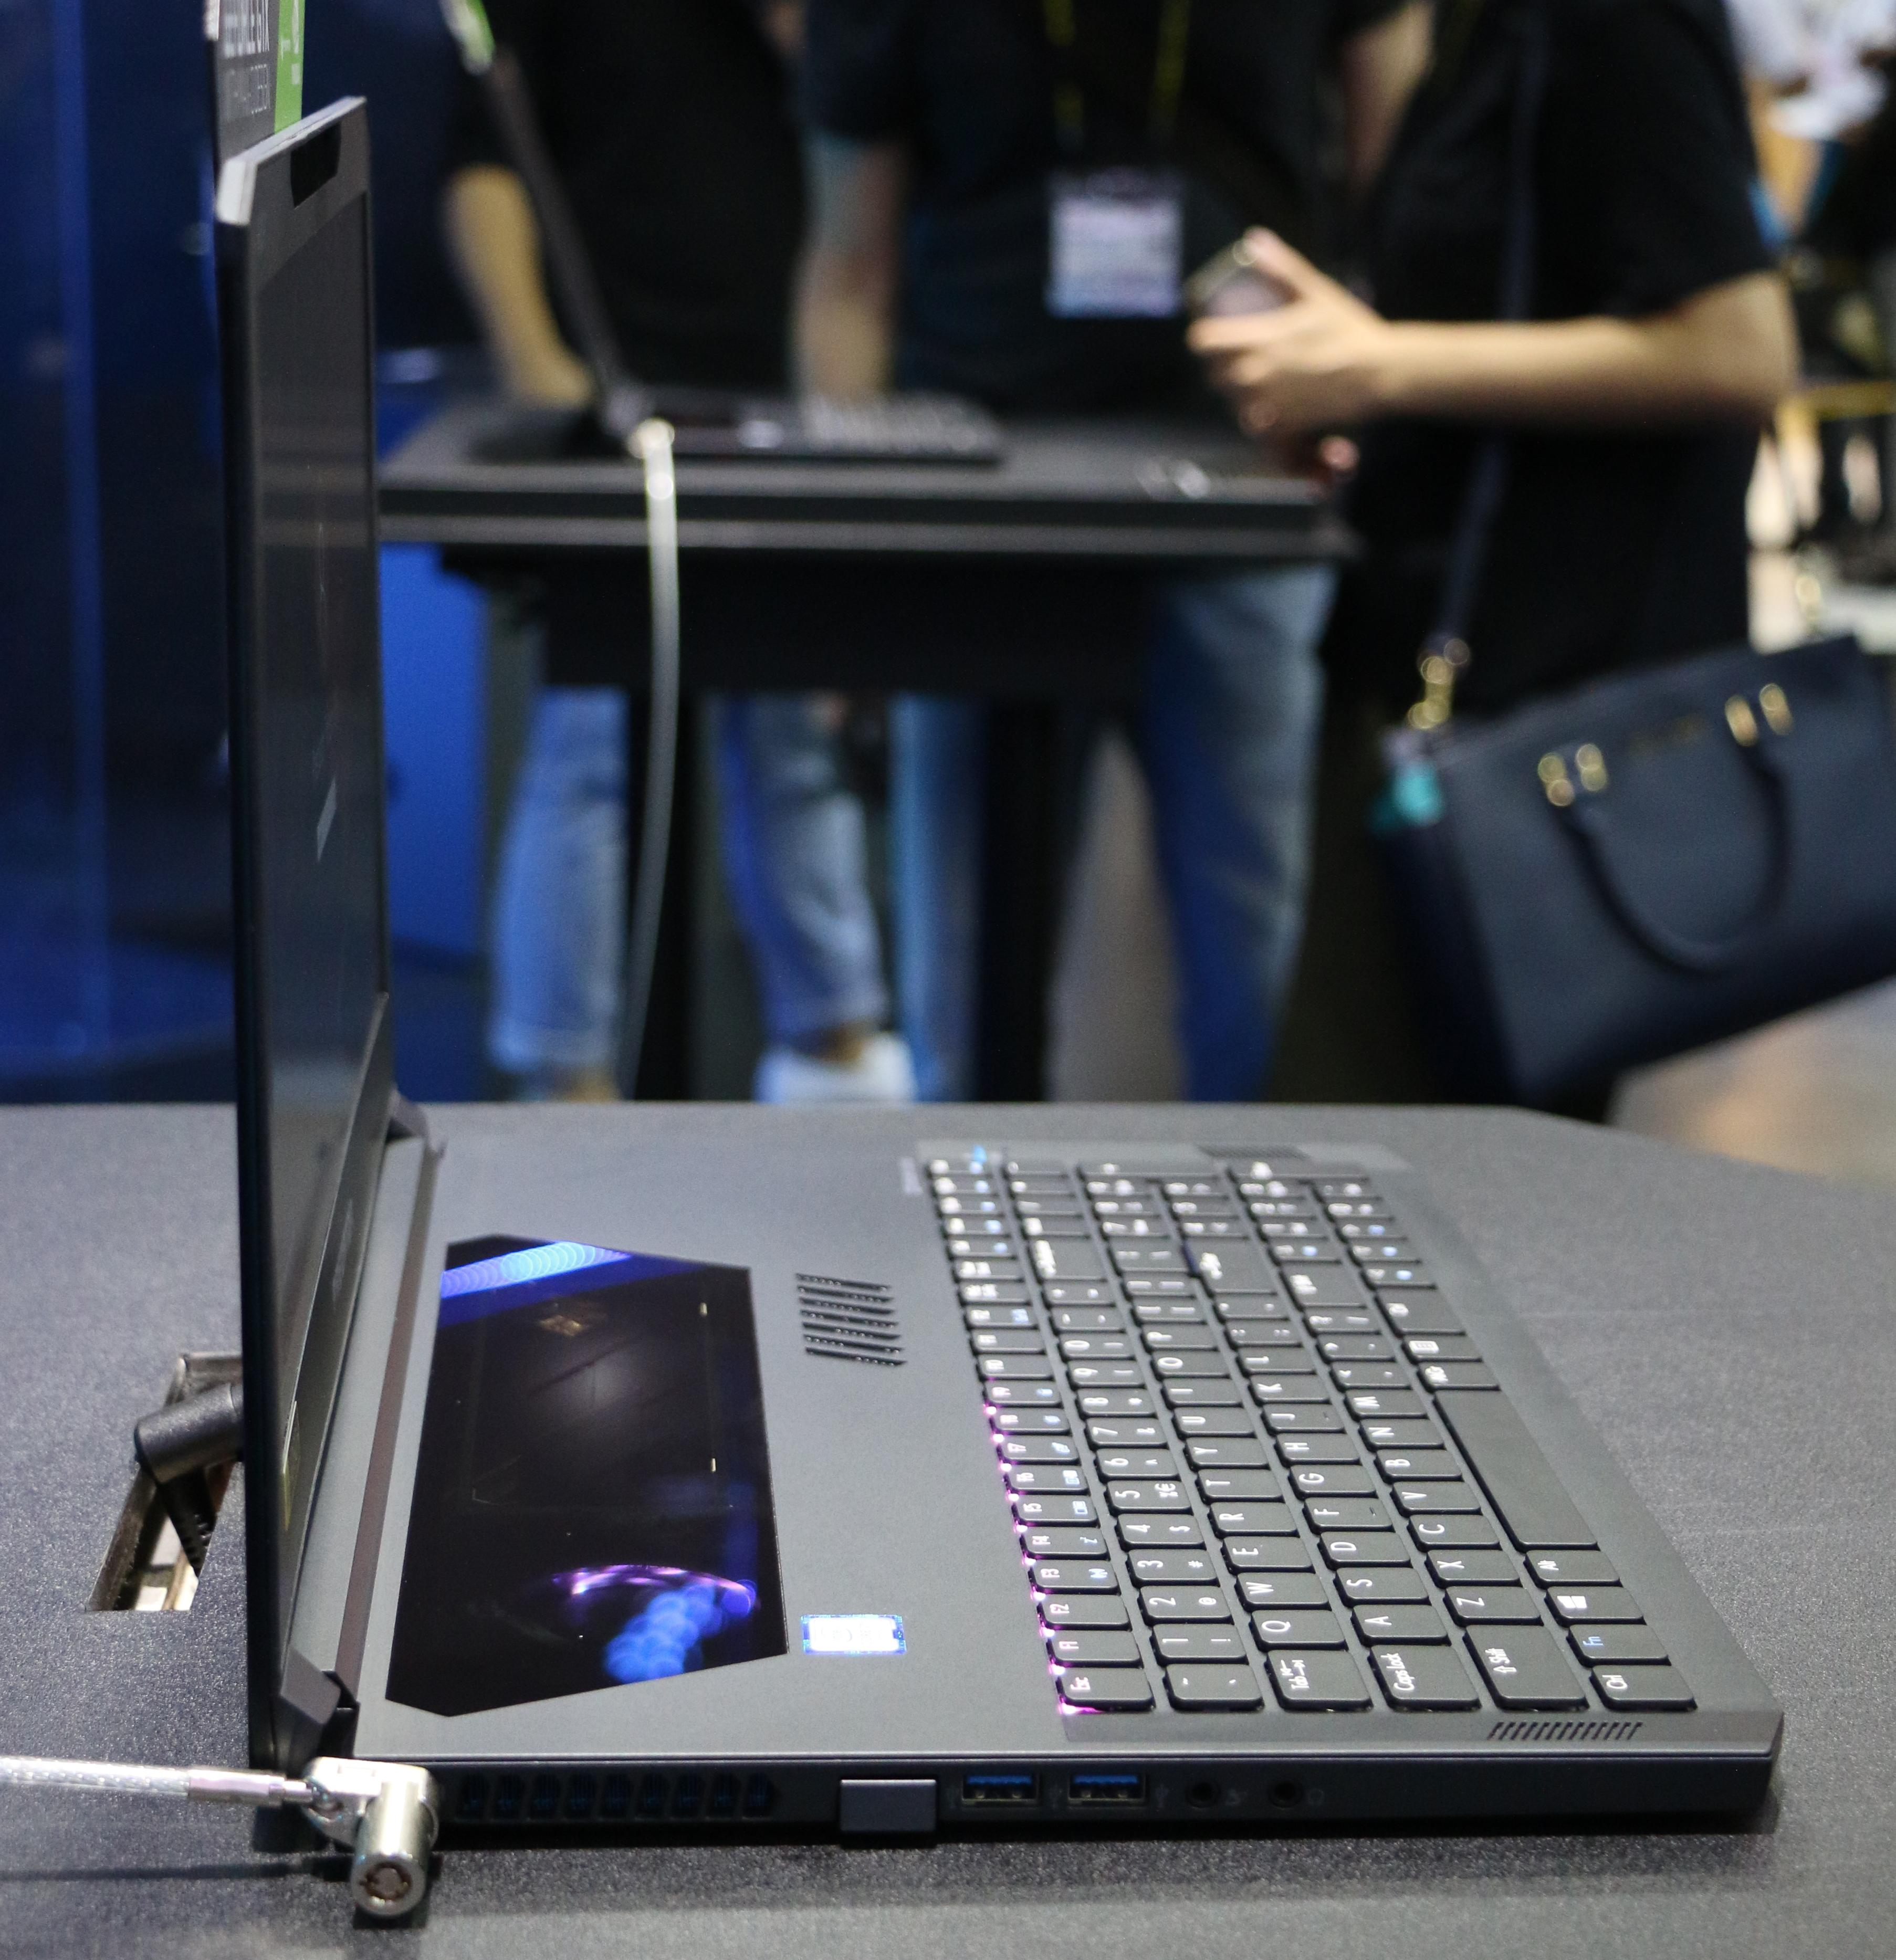 Acer Triton 700.